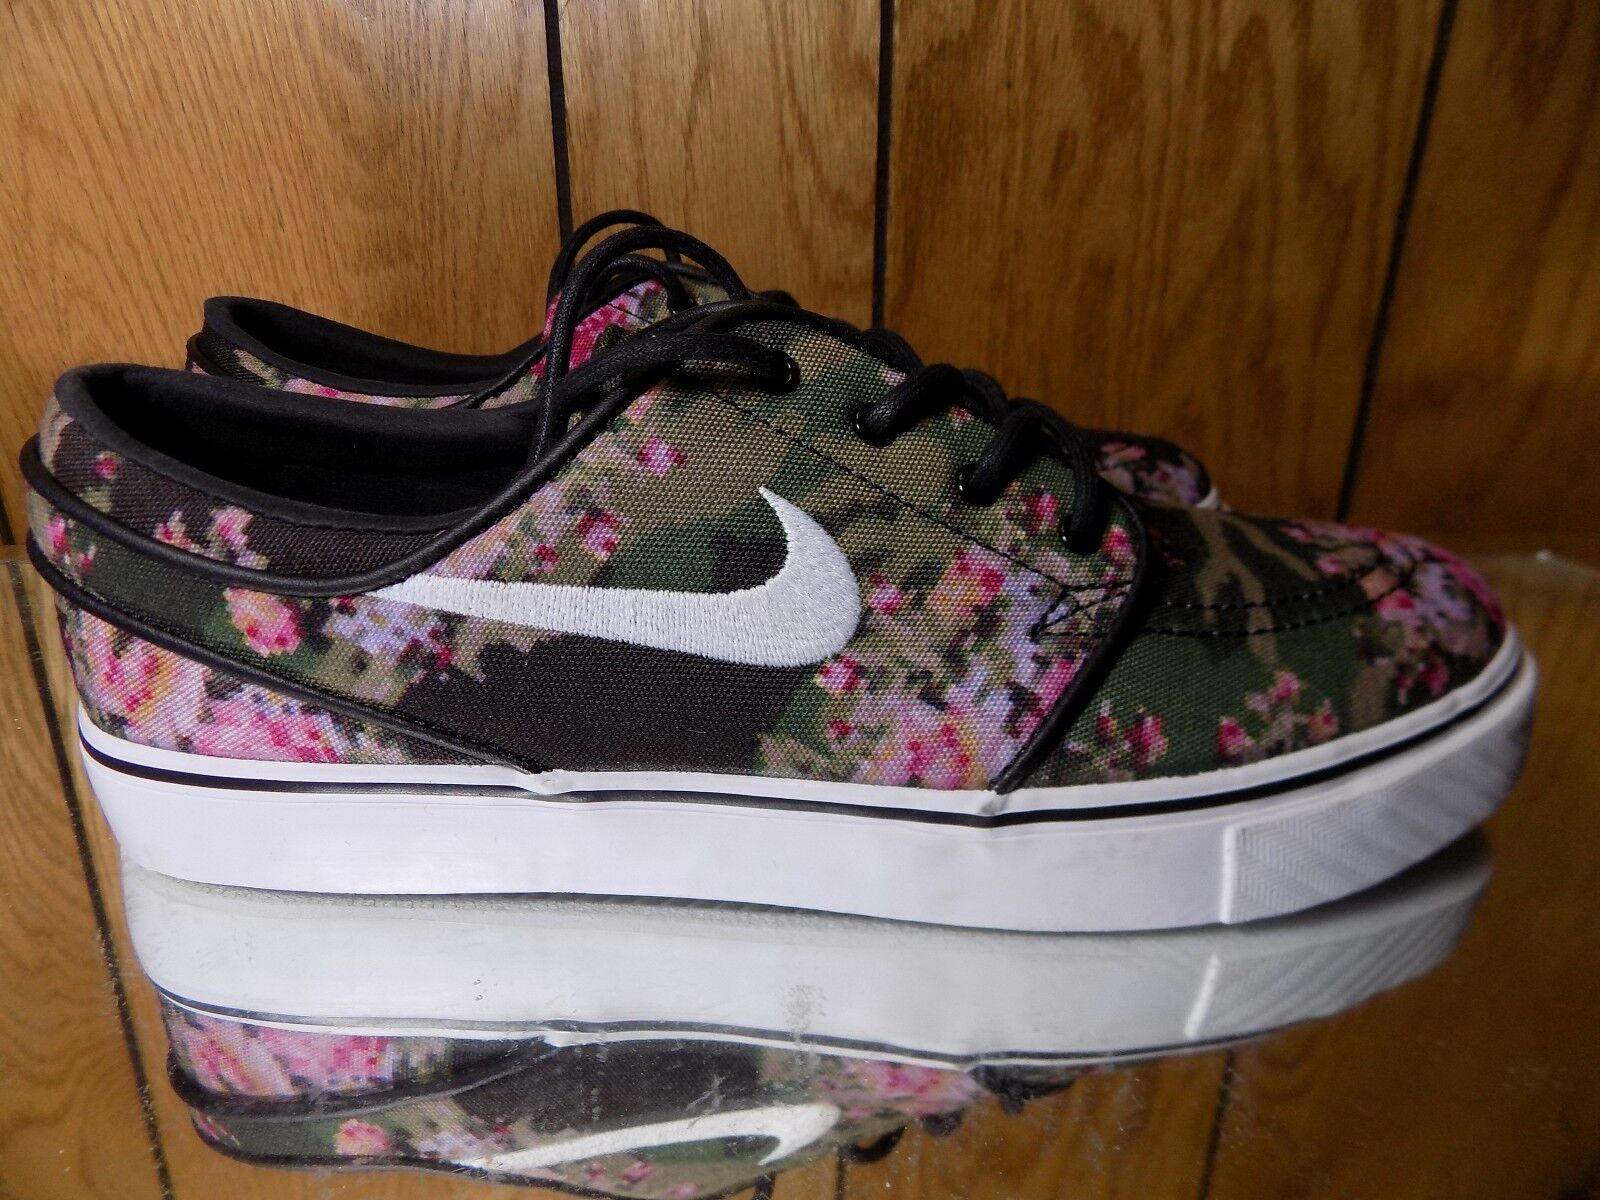 Nike SB Zoom Janoski Premium Floral Digi Camo 482972-900 Size 7